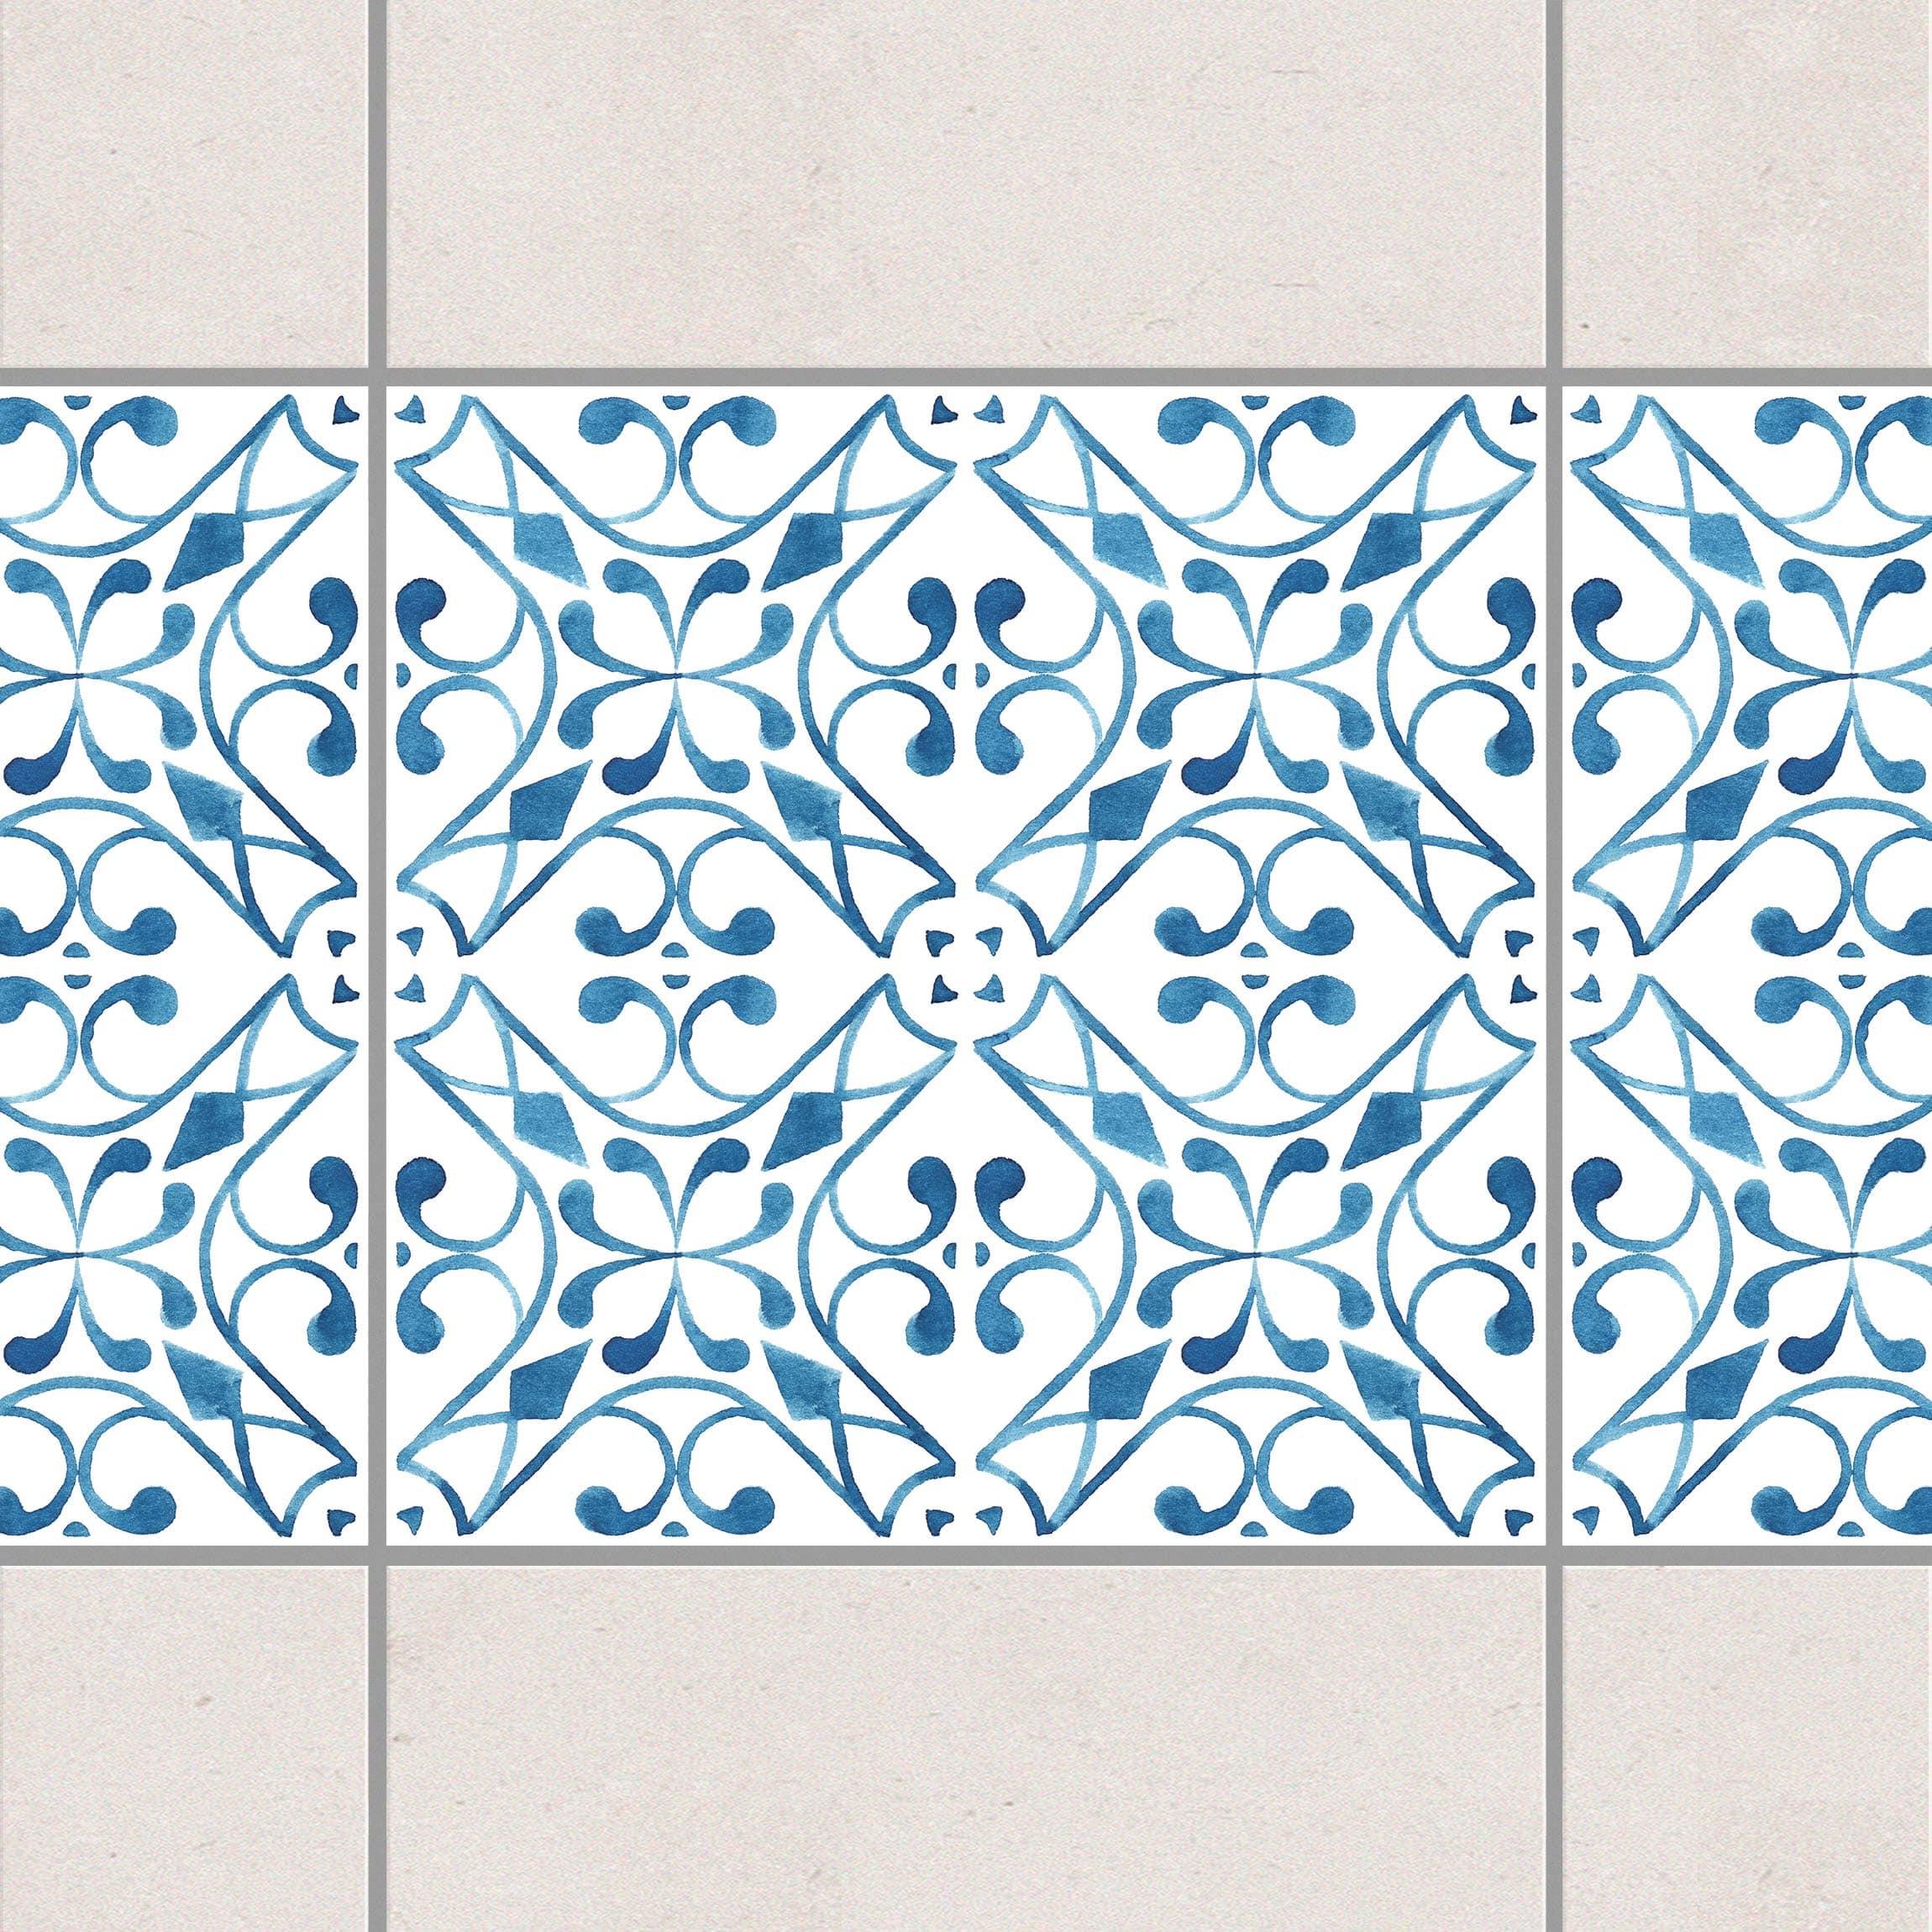 fliesen bord re blau wei muster serie no 3 1 1 quadrat 10cm x 10cm fliesenaufkleber. Black Bedroom Furniture Sets. Home Design Ideas